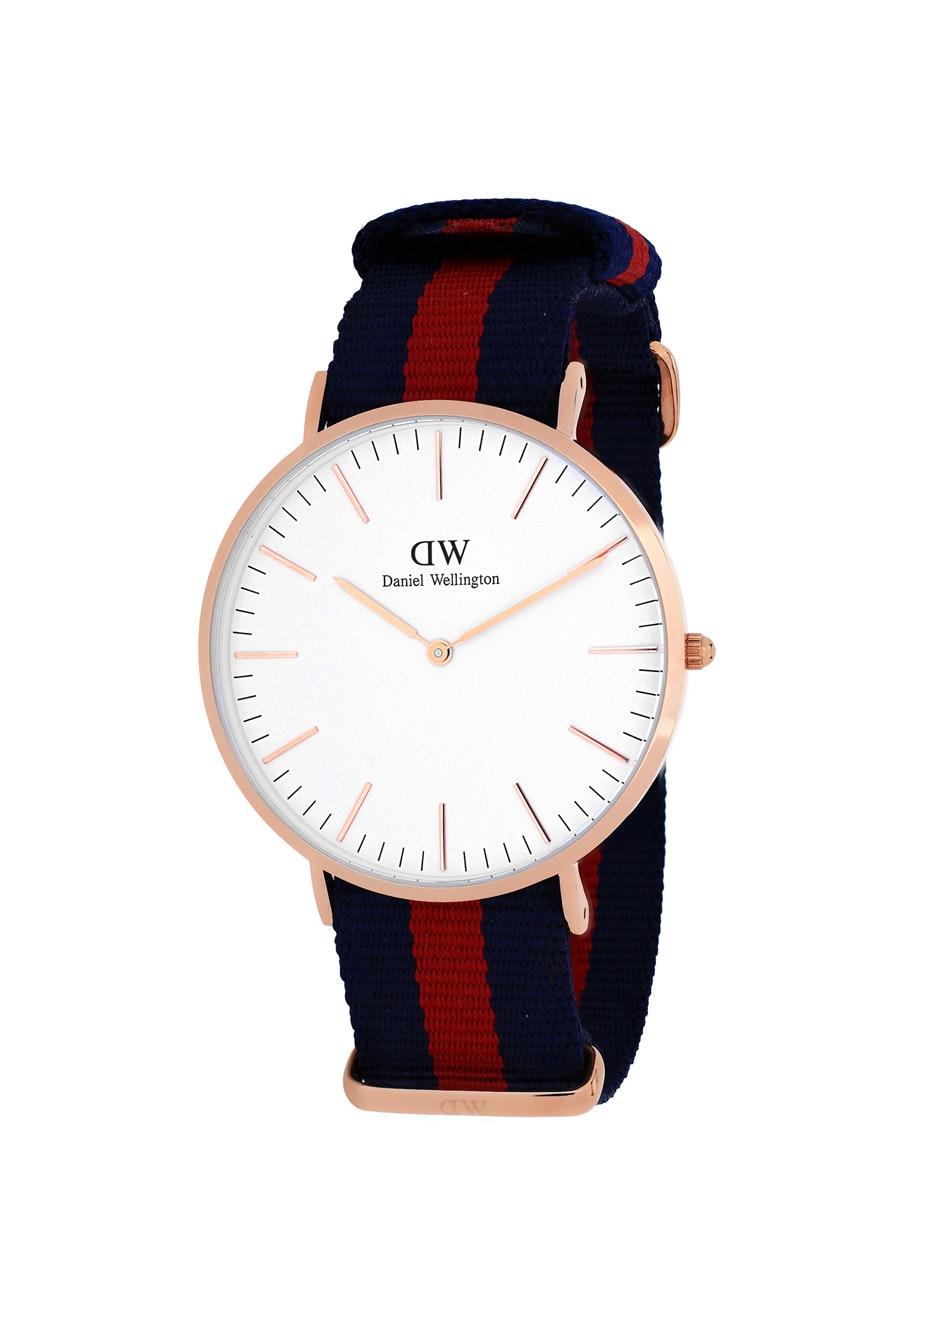 Daniel Wellington Men's Classic Oxford - Two-tone Navy B